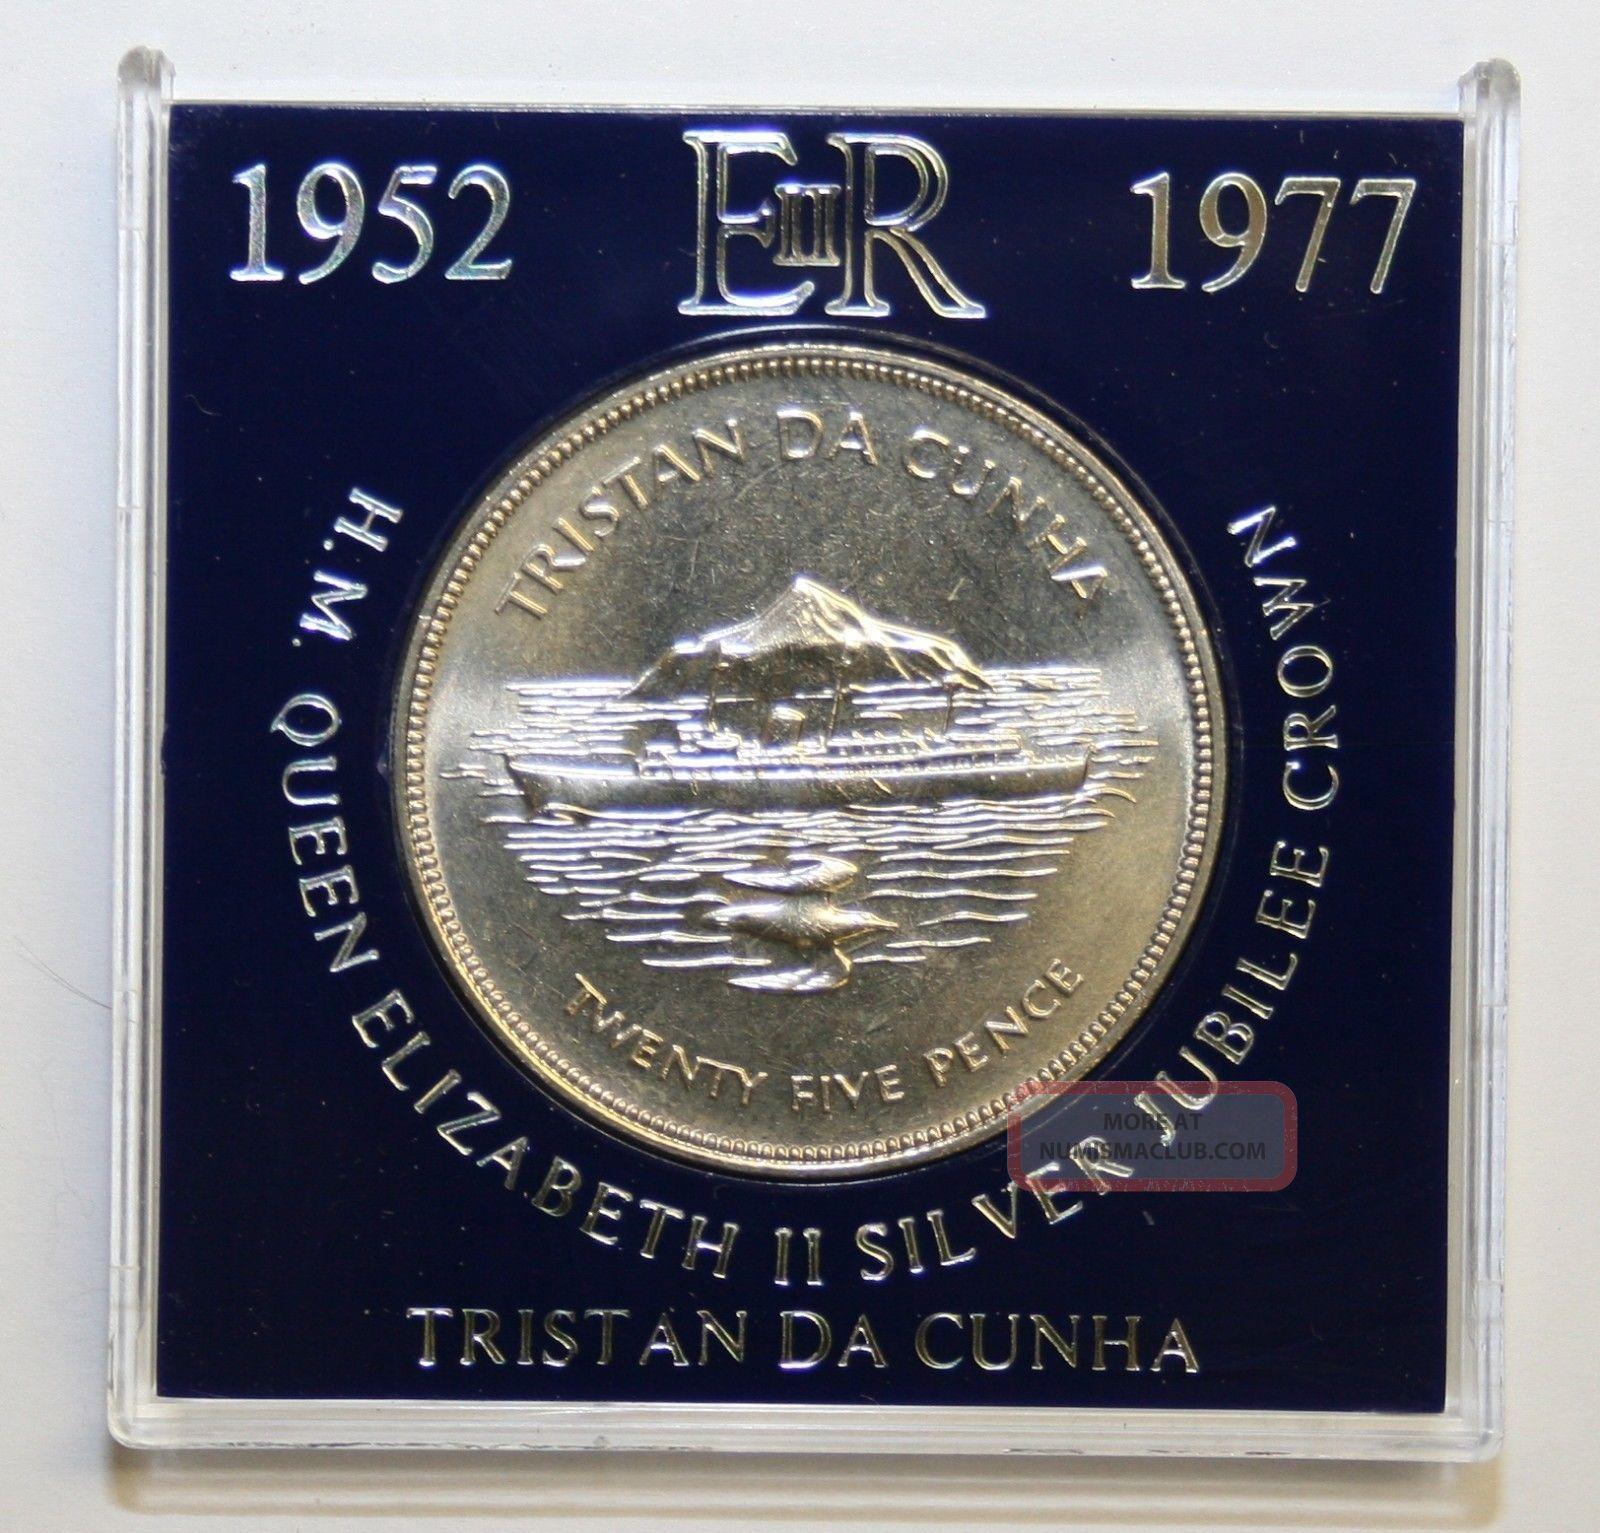 1977 Tristan Da Cunha Uncirculated Cased Crown Silver Jubilee Coins: World photo